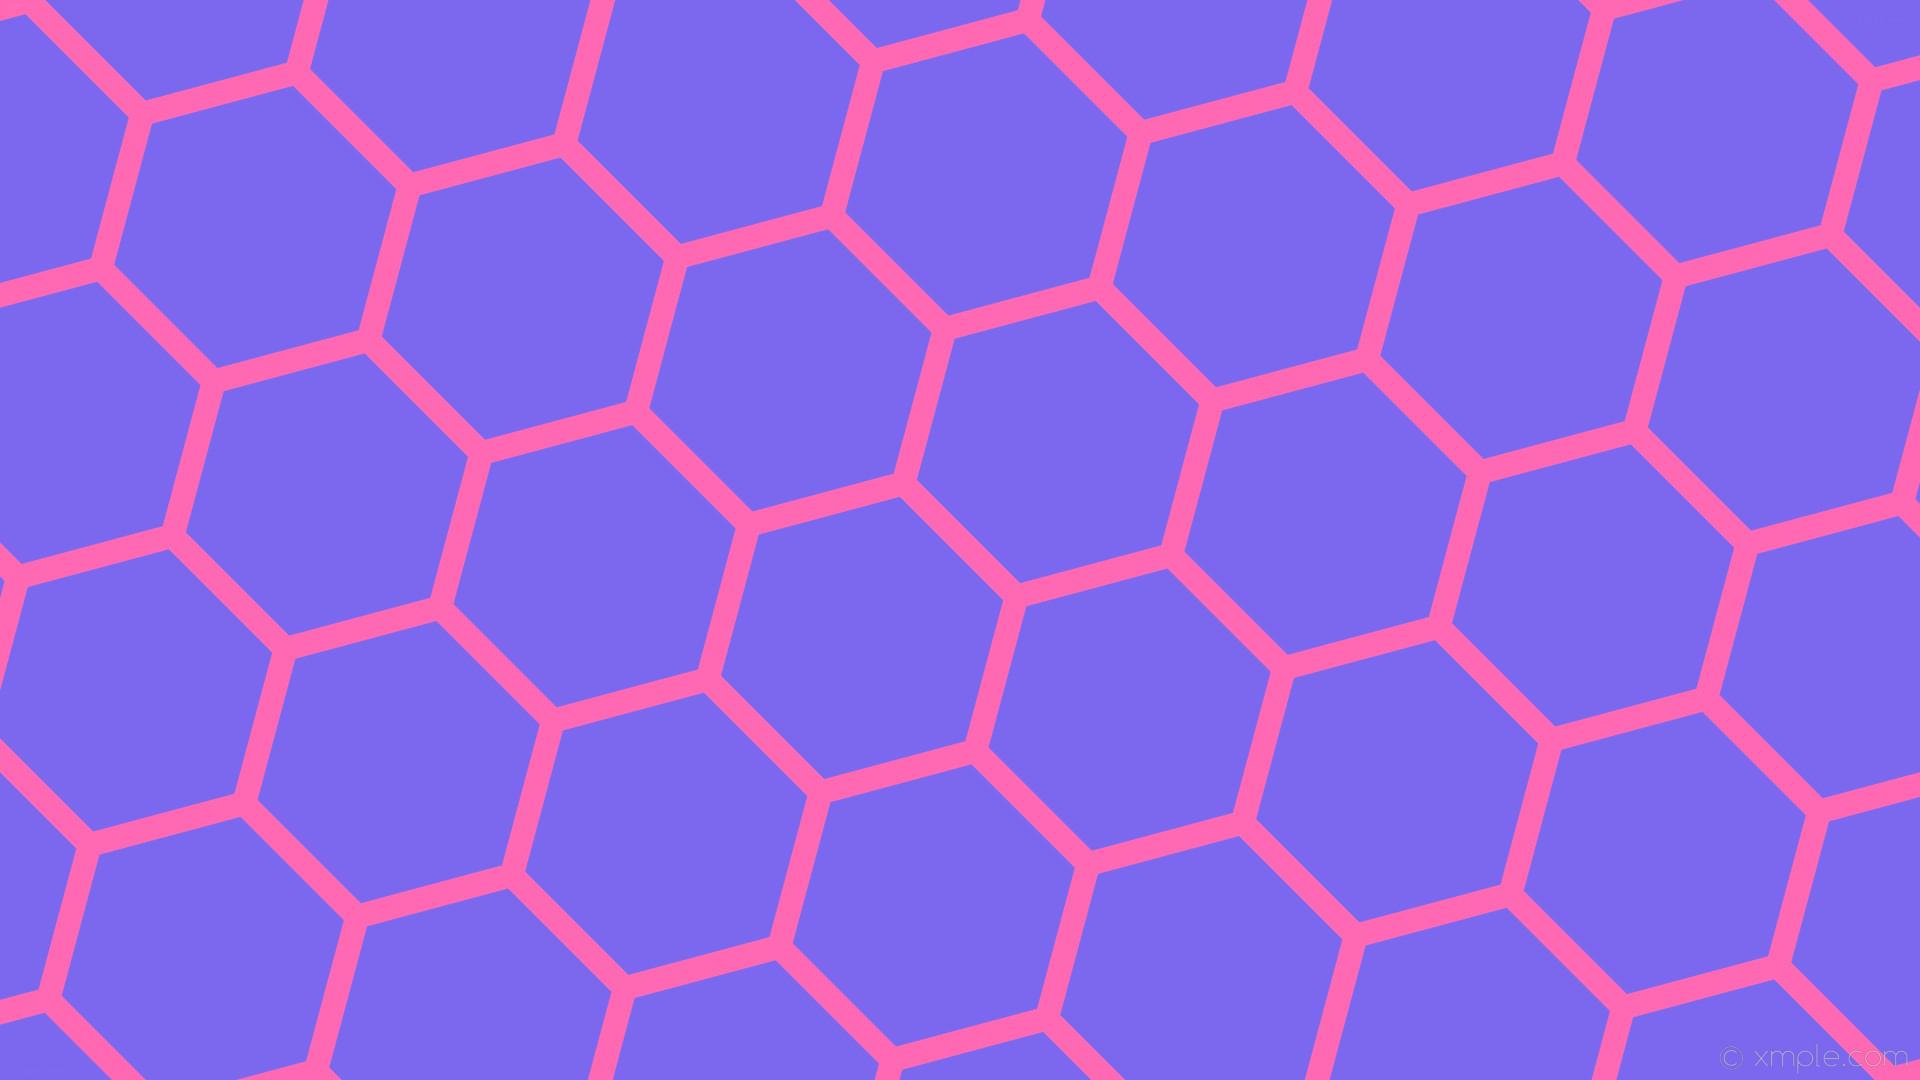 wallpaper purple honeycomb beehive hexagon pink medium slate blue hot pink  #7b68ee #ff69b4 diagonal